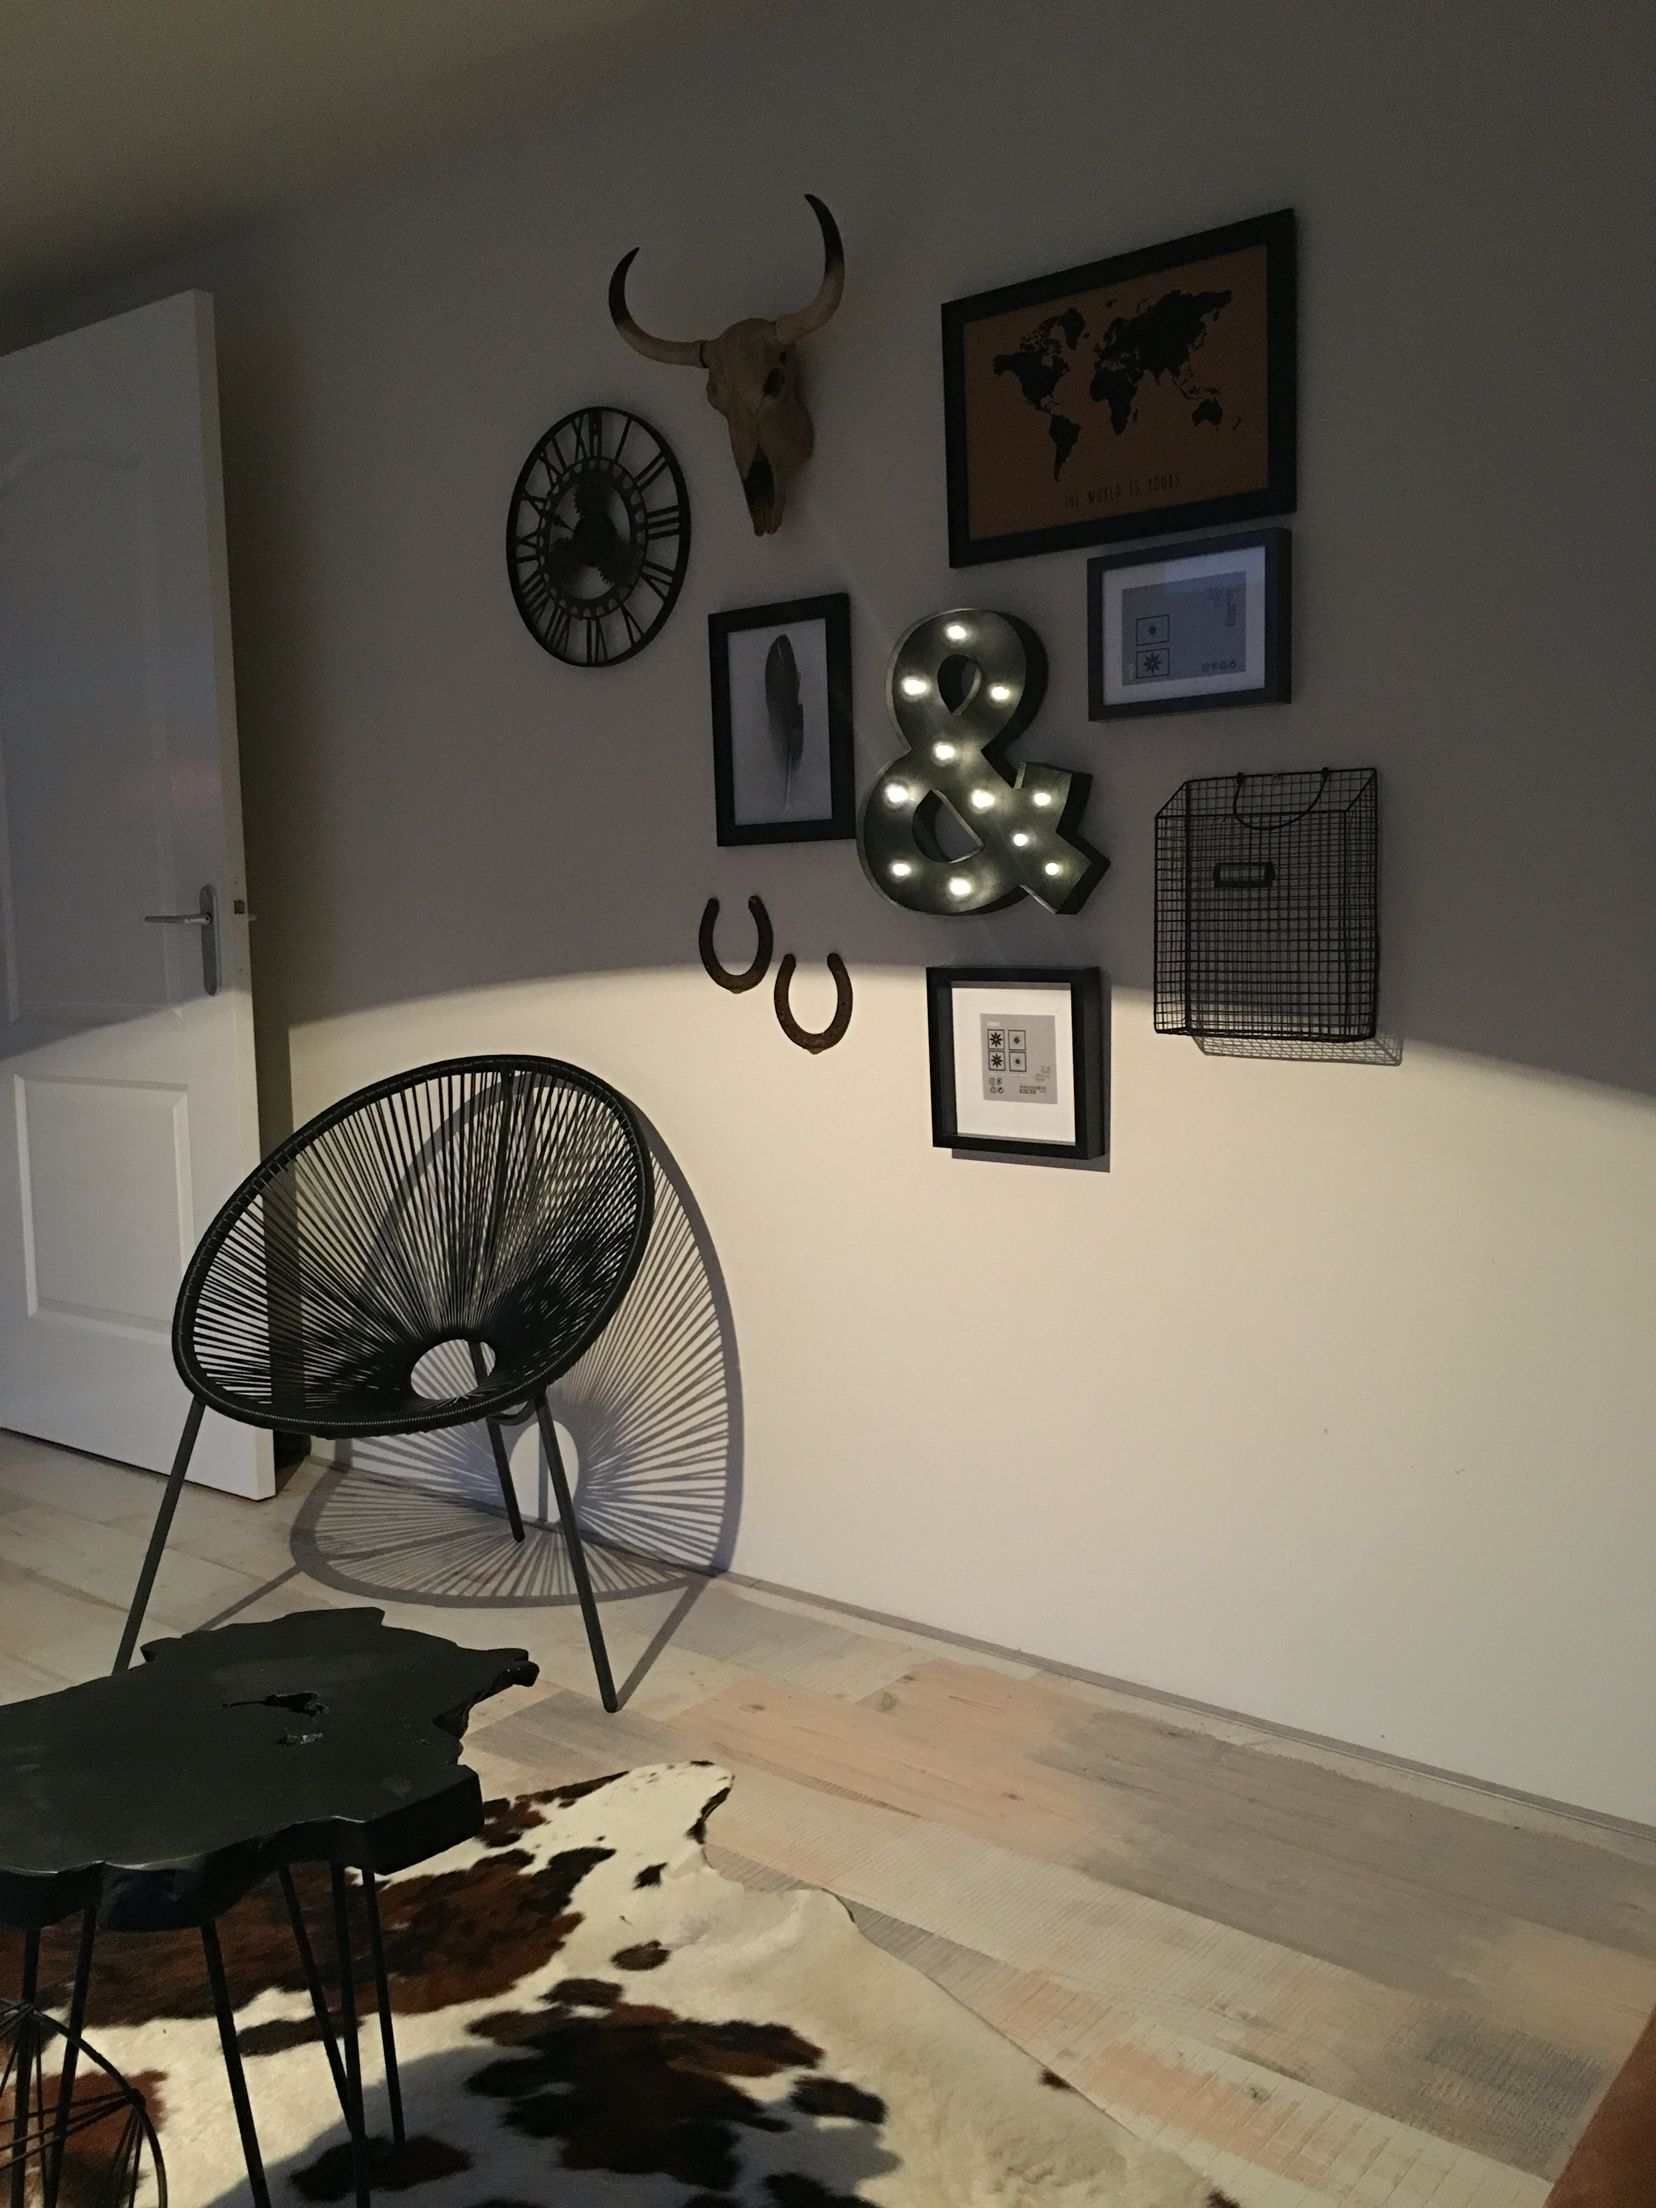 Muurdecoratie industrieel sfeerlicht idee n nieuw interieur 2017 pinterest industrieel - Nacht kamer decoratie ...